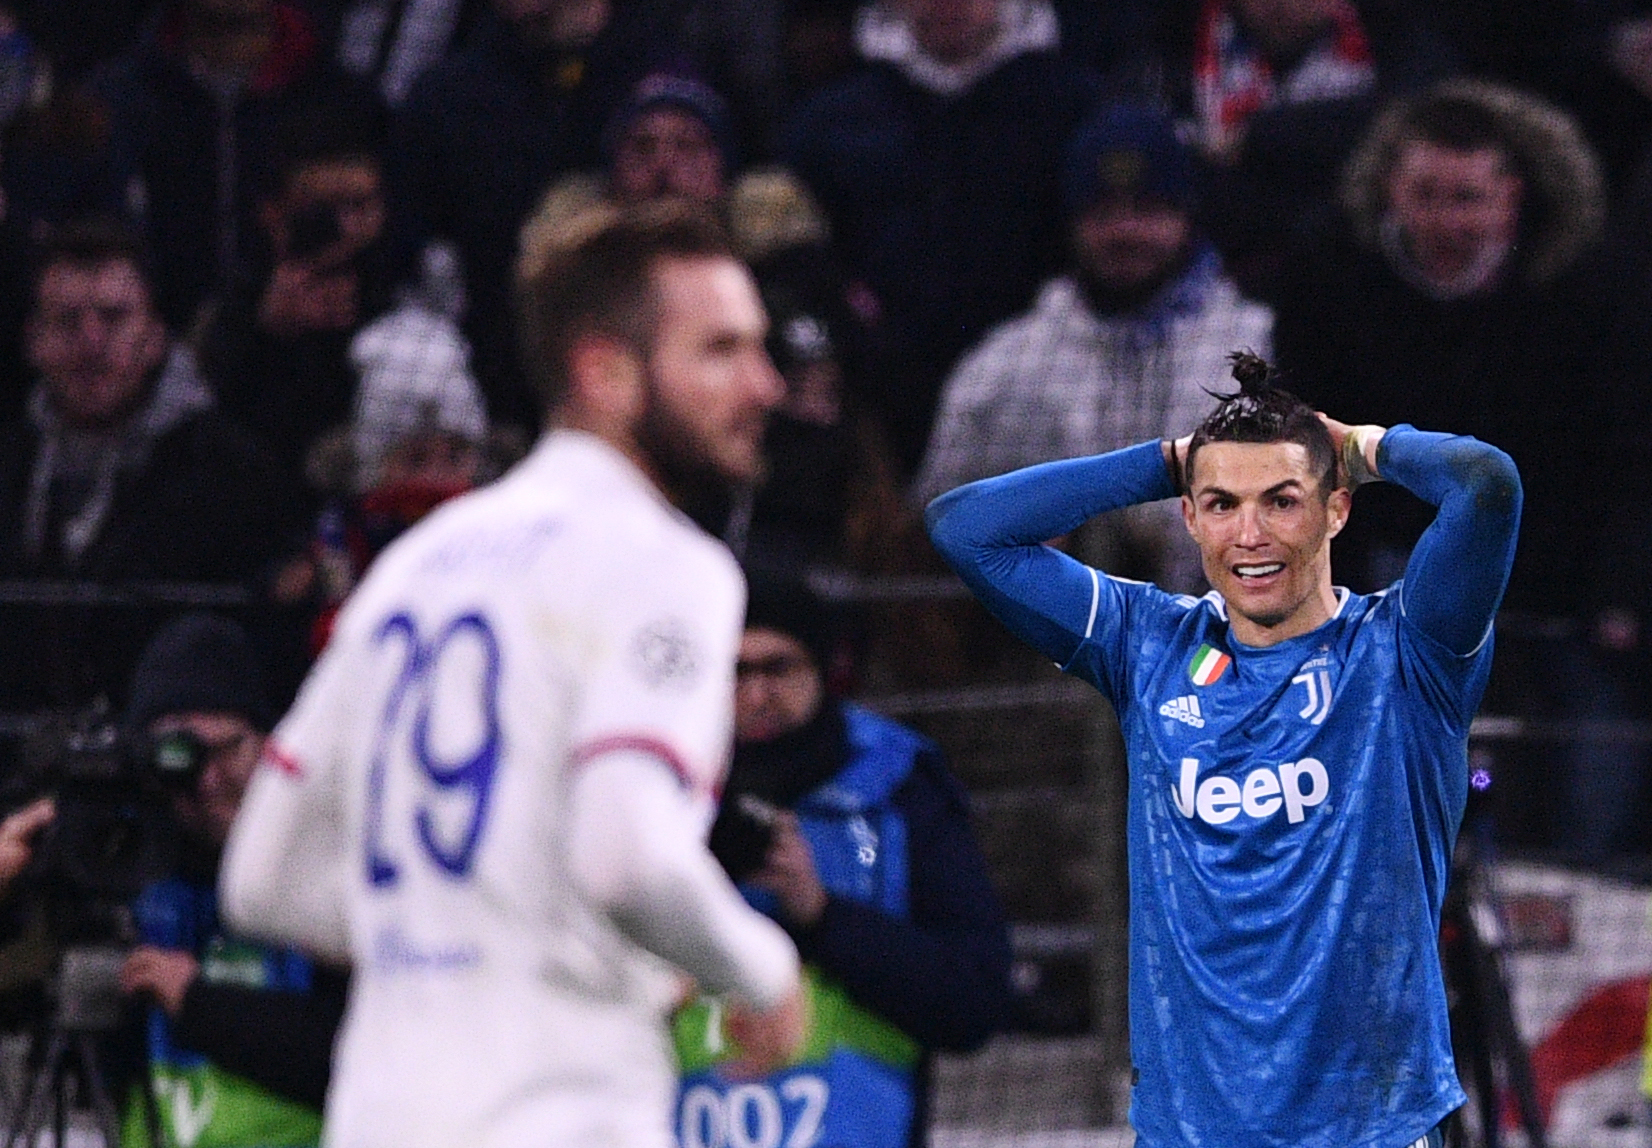 Újraindul a Bajnokok Ligája, a Real Madrid már ki is eshet